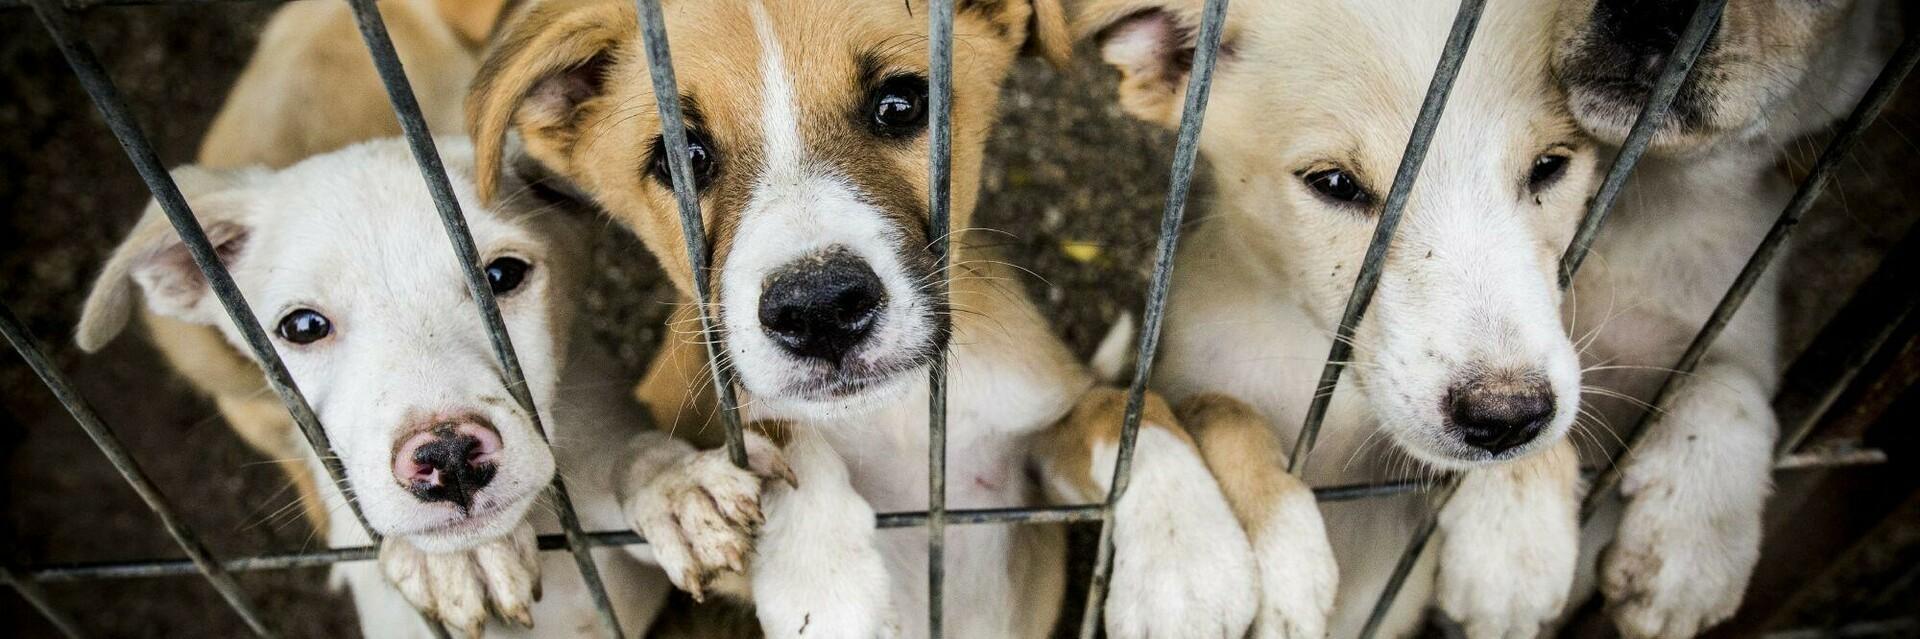 Des chiens à adopter